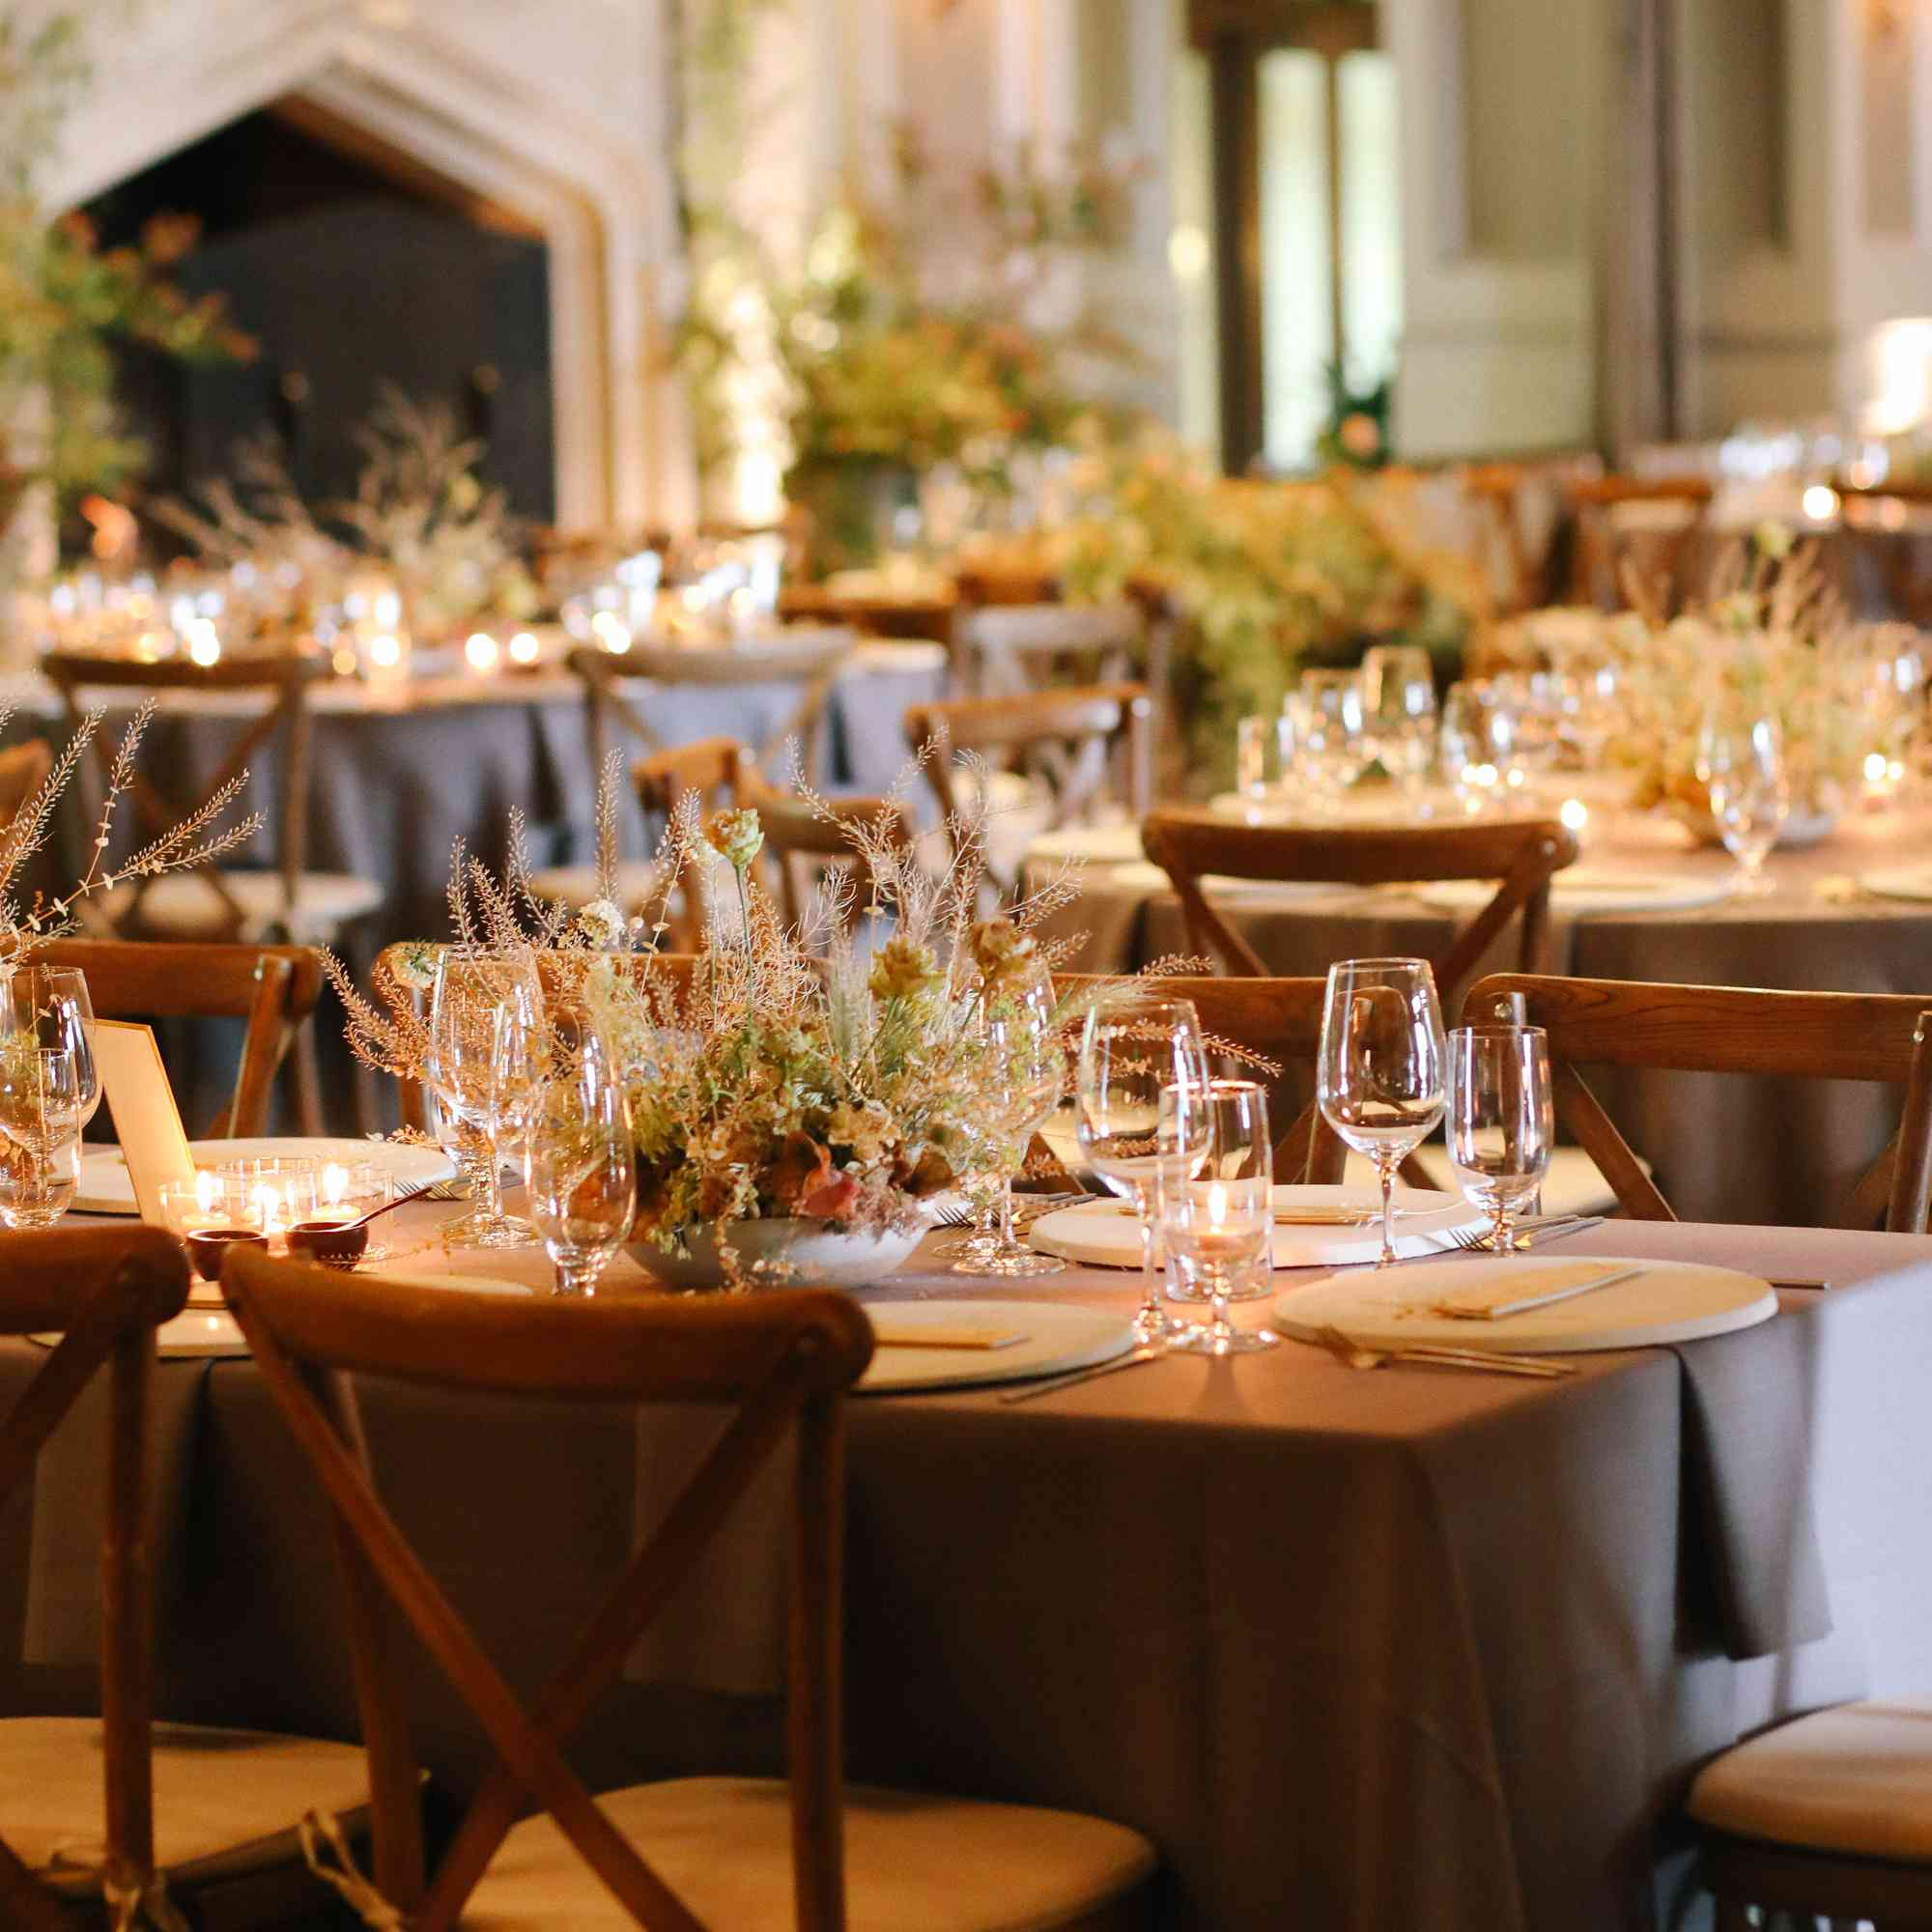 savannah and riker wedding, reception